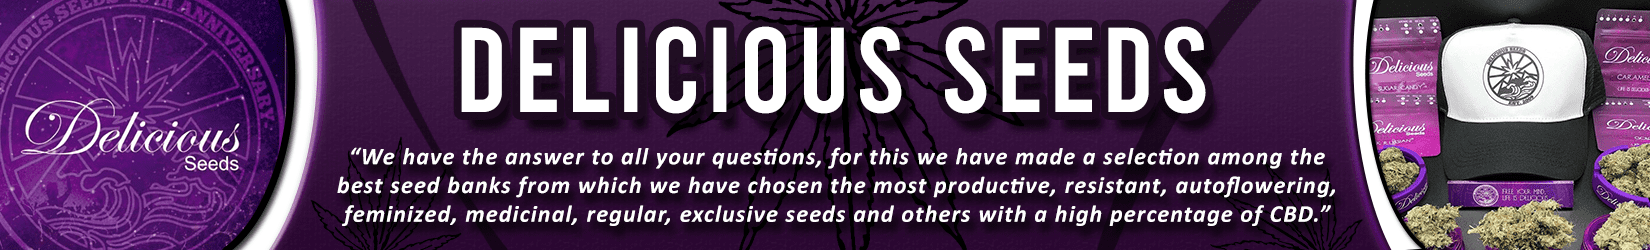 Cannabis Seeds Breeder - Delicious Seeds